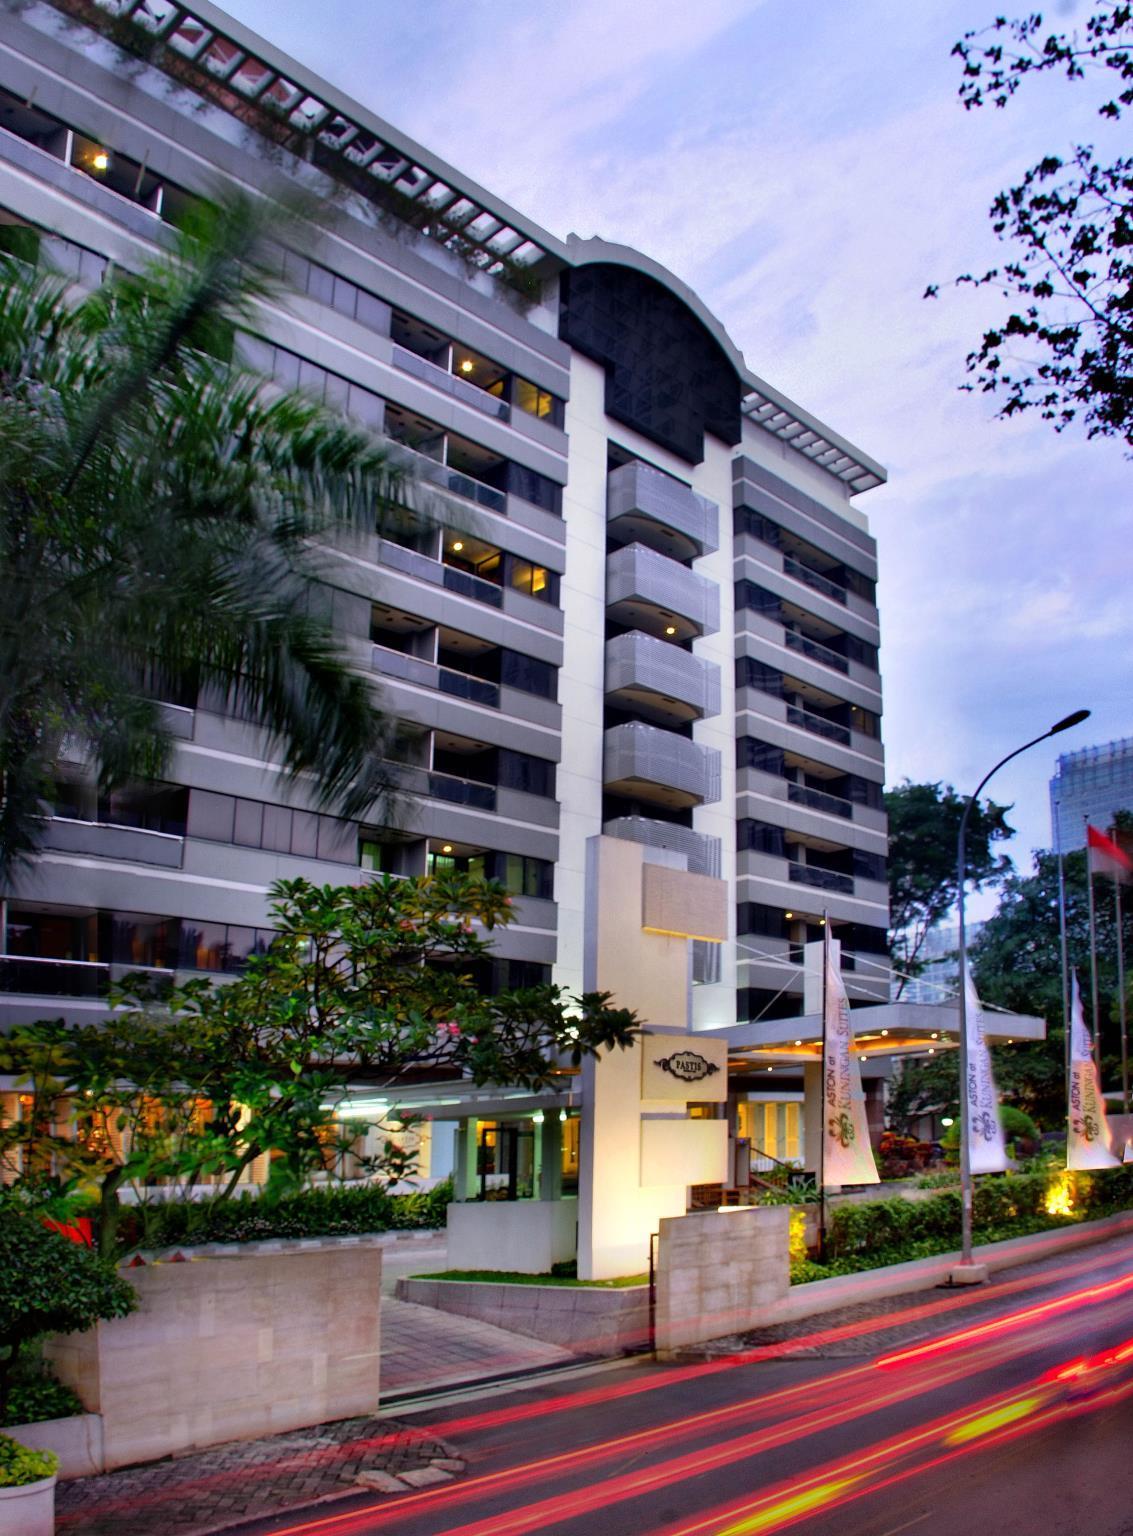 Alivio Suites Kuningan Aston At Kuningan Suites Hotel Kuningan Jakarta Indonesia